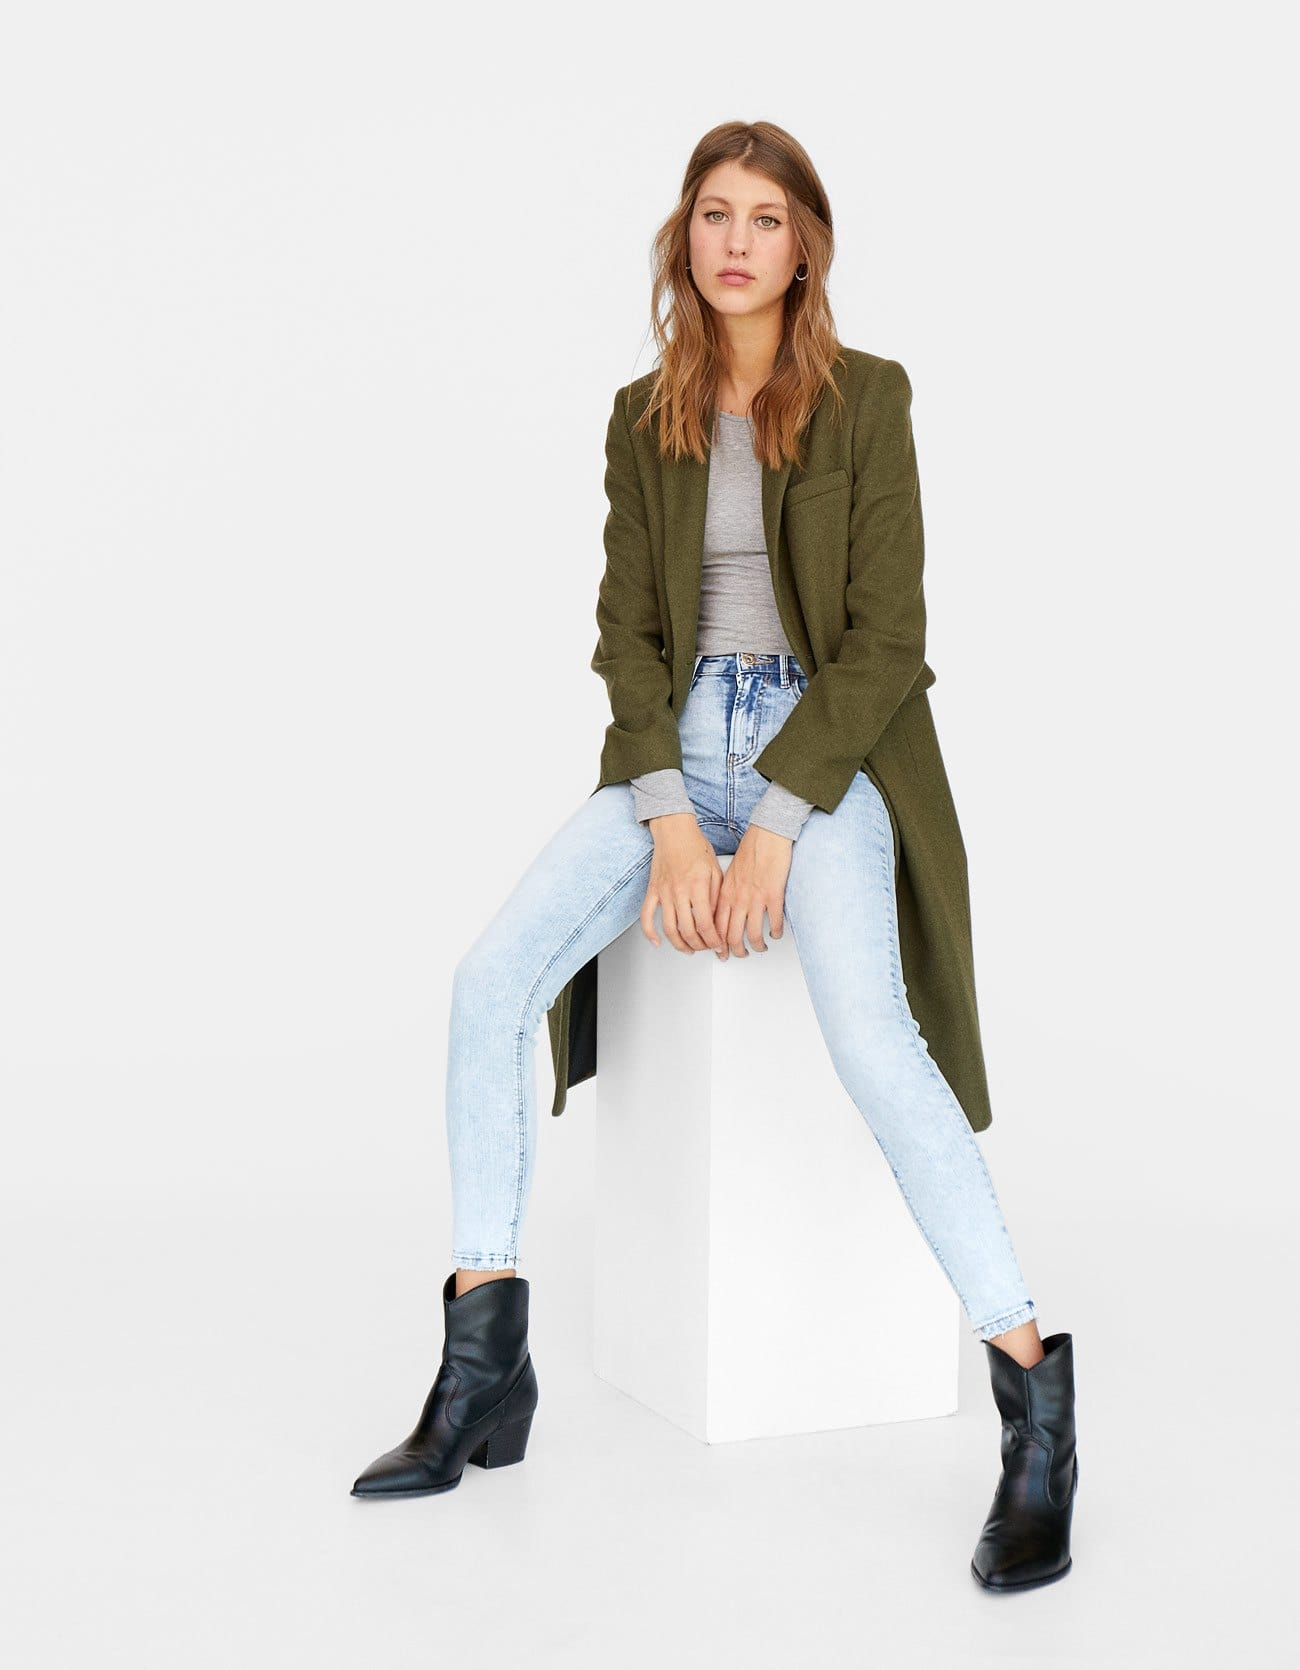 Jeans chiari a vita alta a 19,99 euro